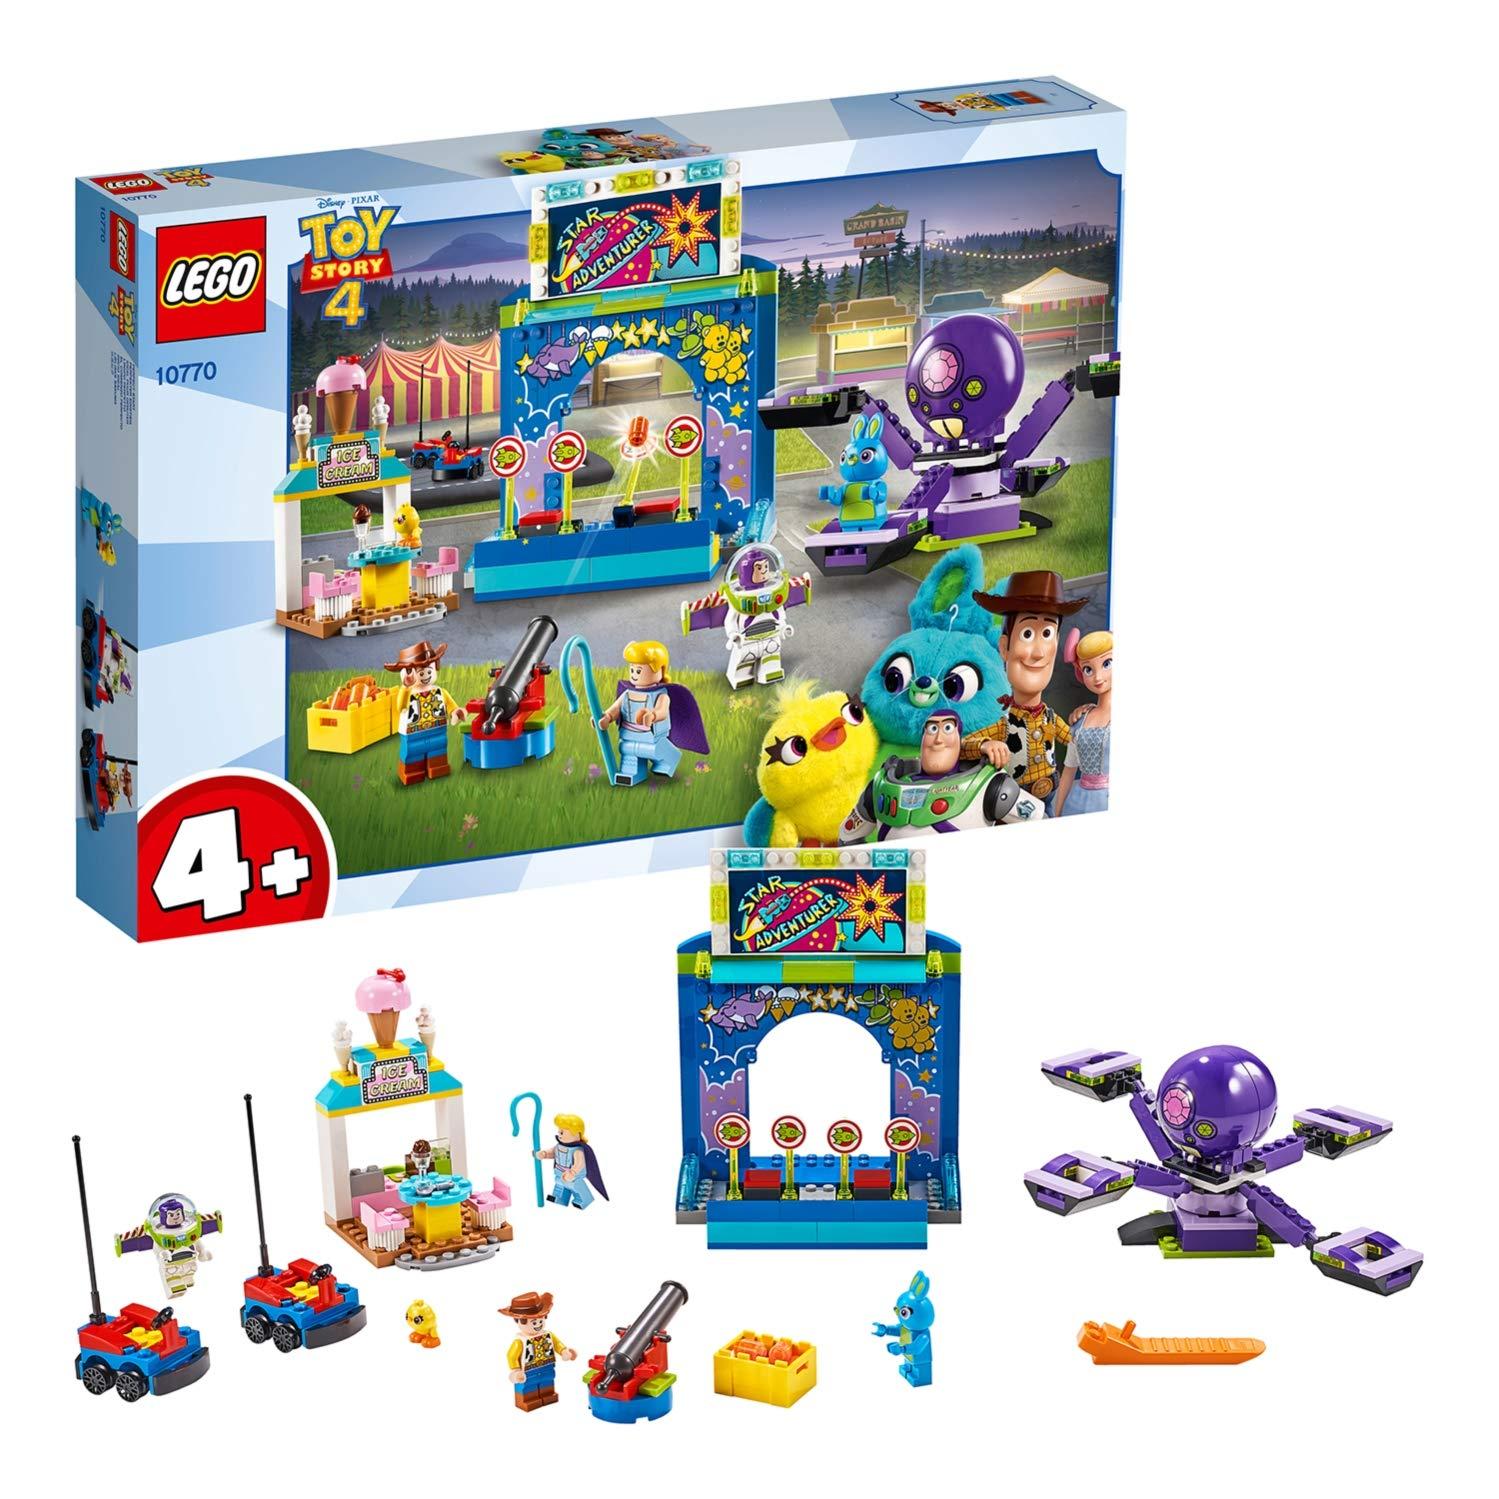 LEGO 10770 - Toy Story 4 Buzz & Woody's Carnival Mania - £40.80 @ Amazon